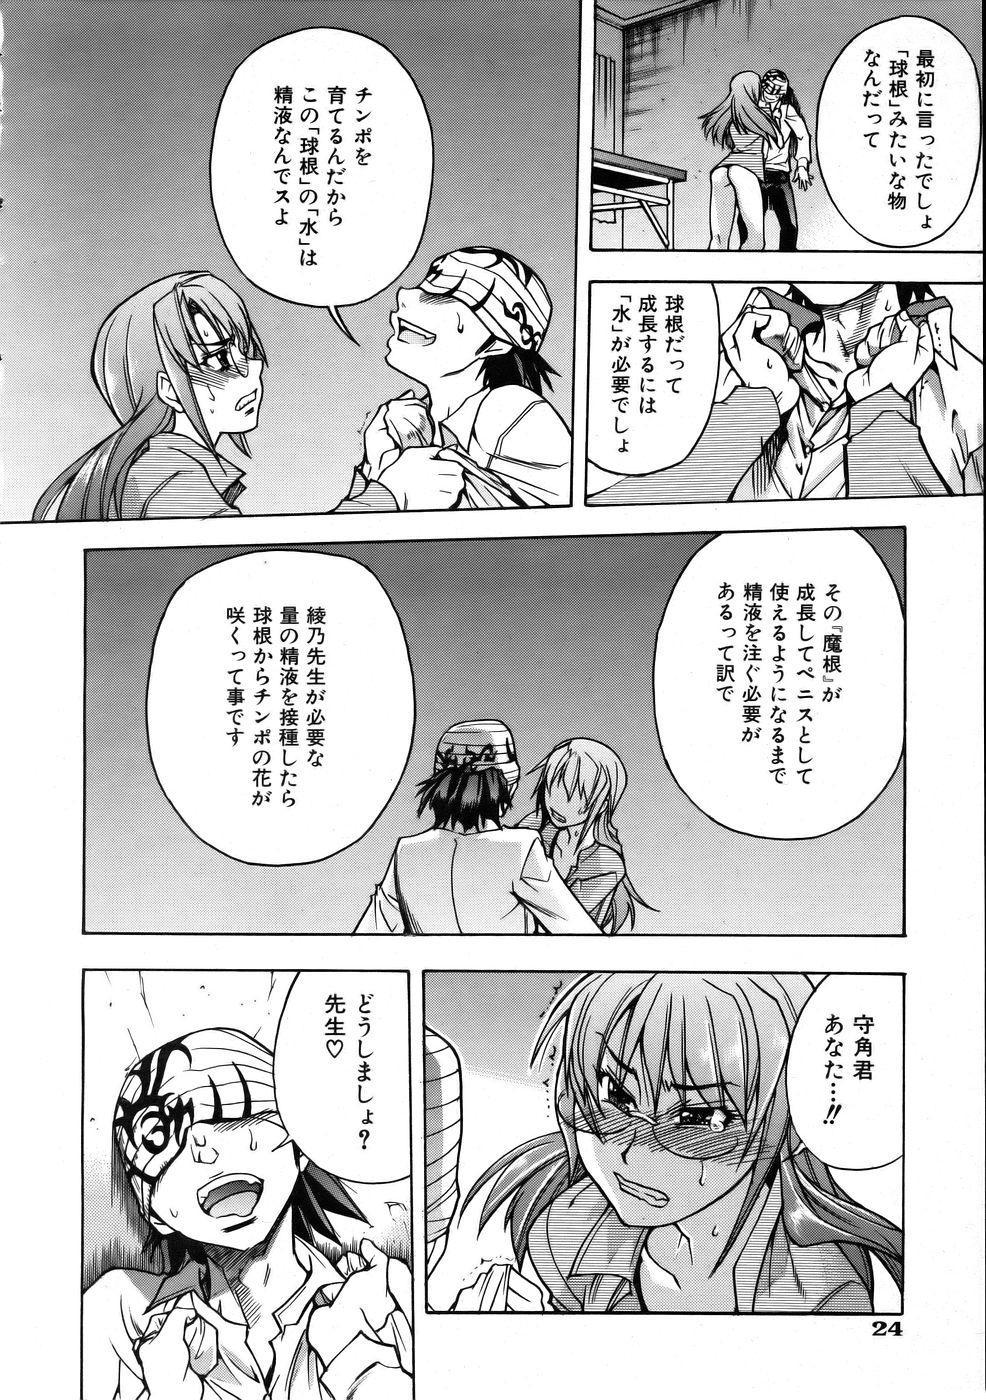 COMIC AUN 2005-10 Vol. 113 23